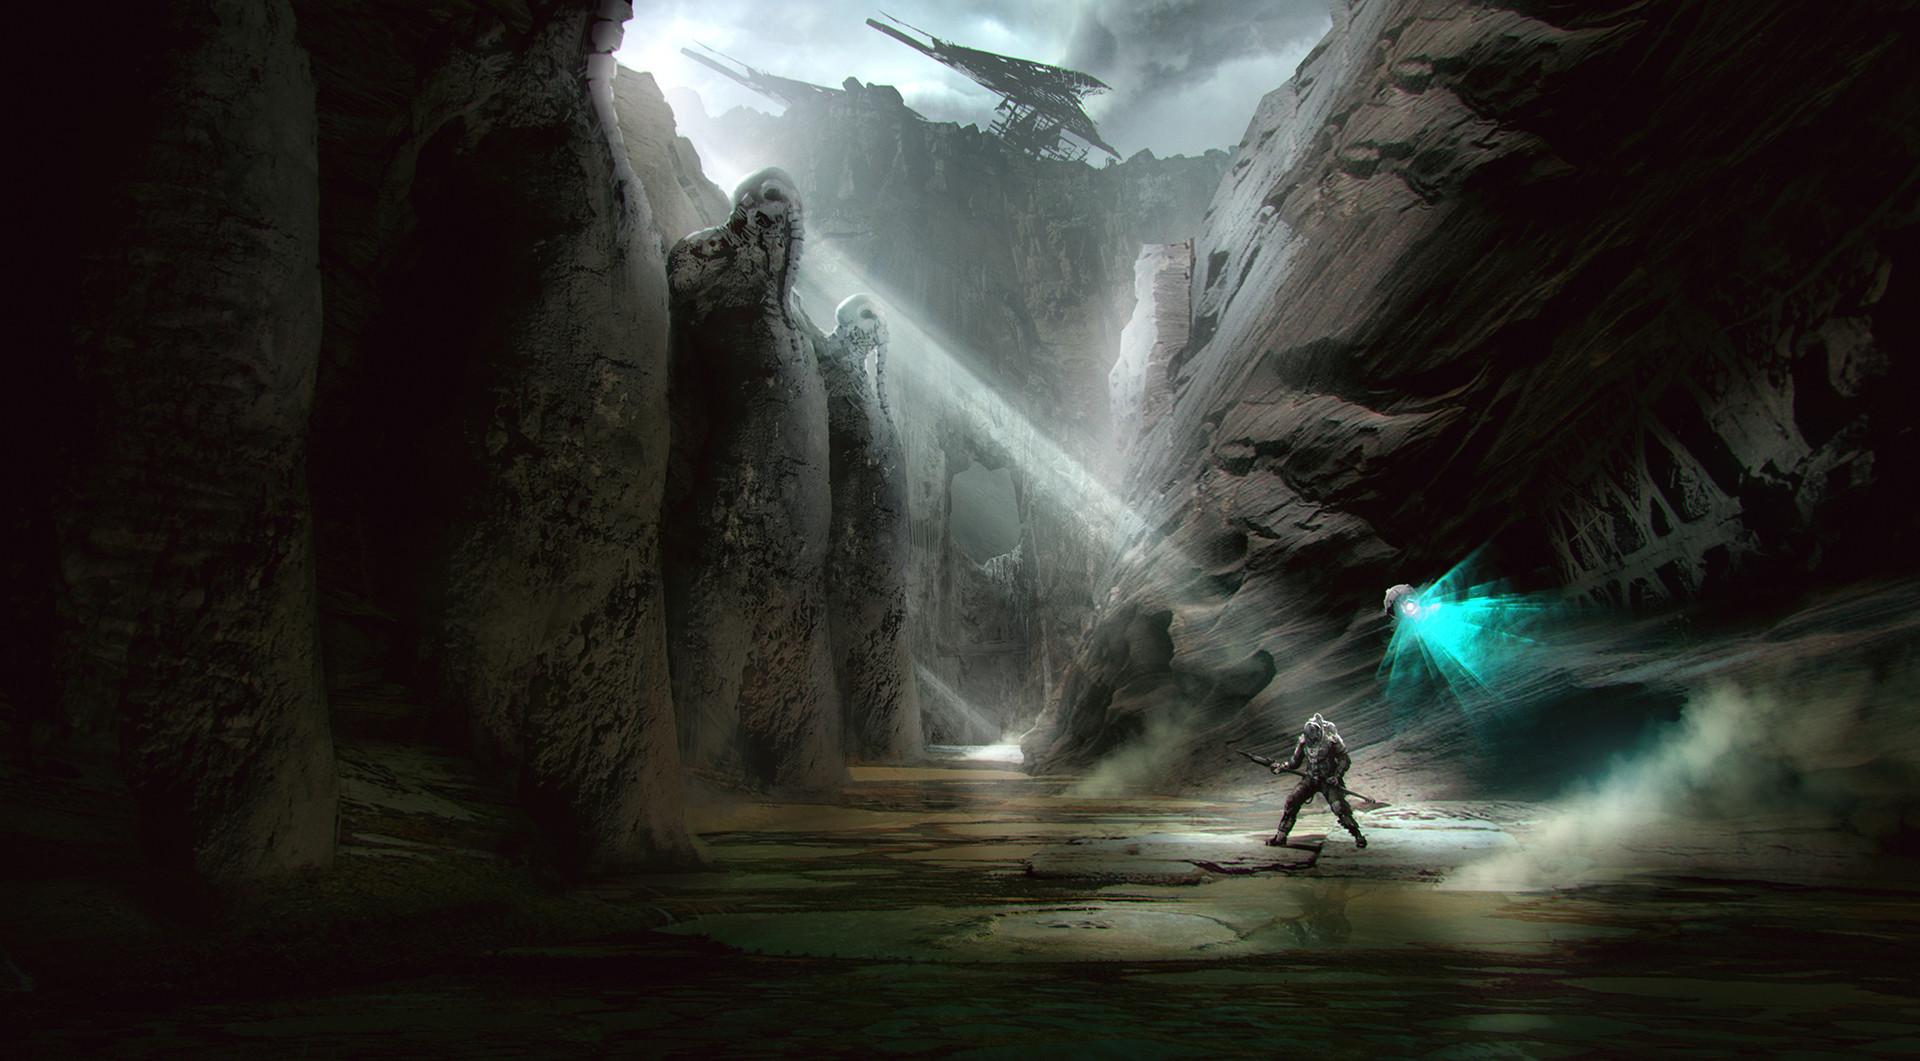 Joakim ericsson canyon small